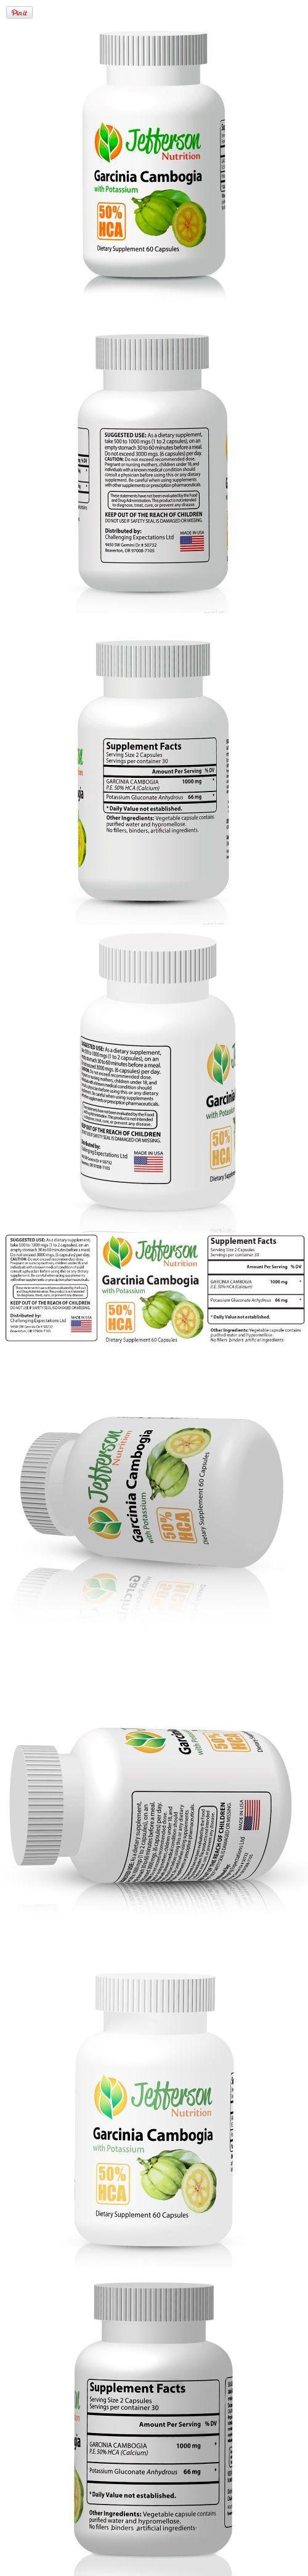 Garcinia Cambogia Extract 50% HCA, added potassium and no binders